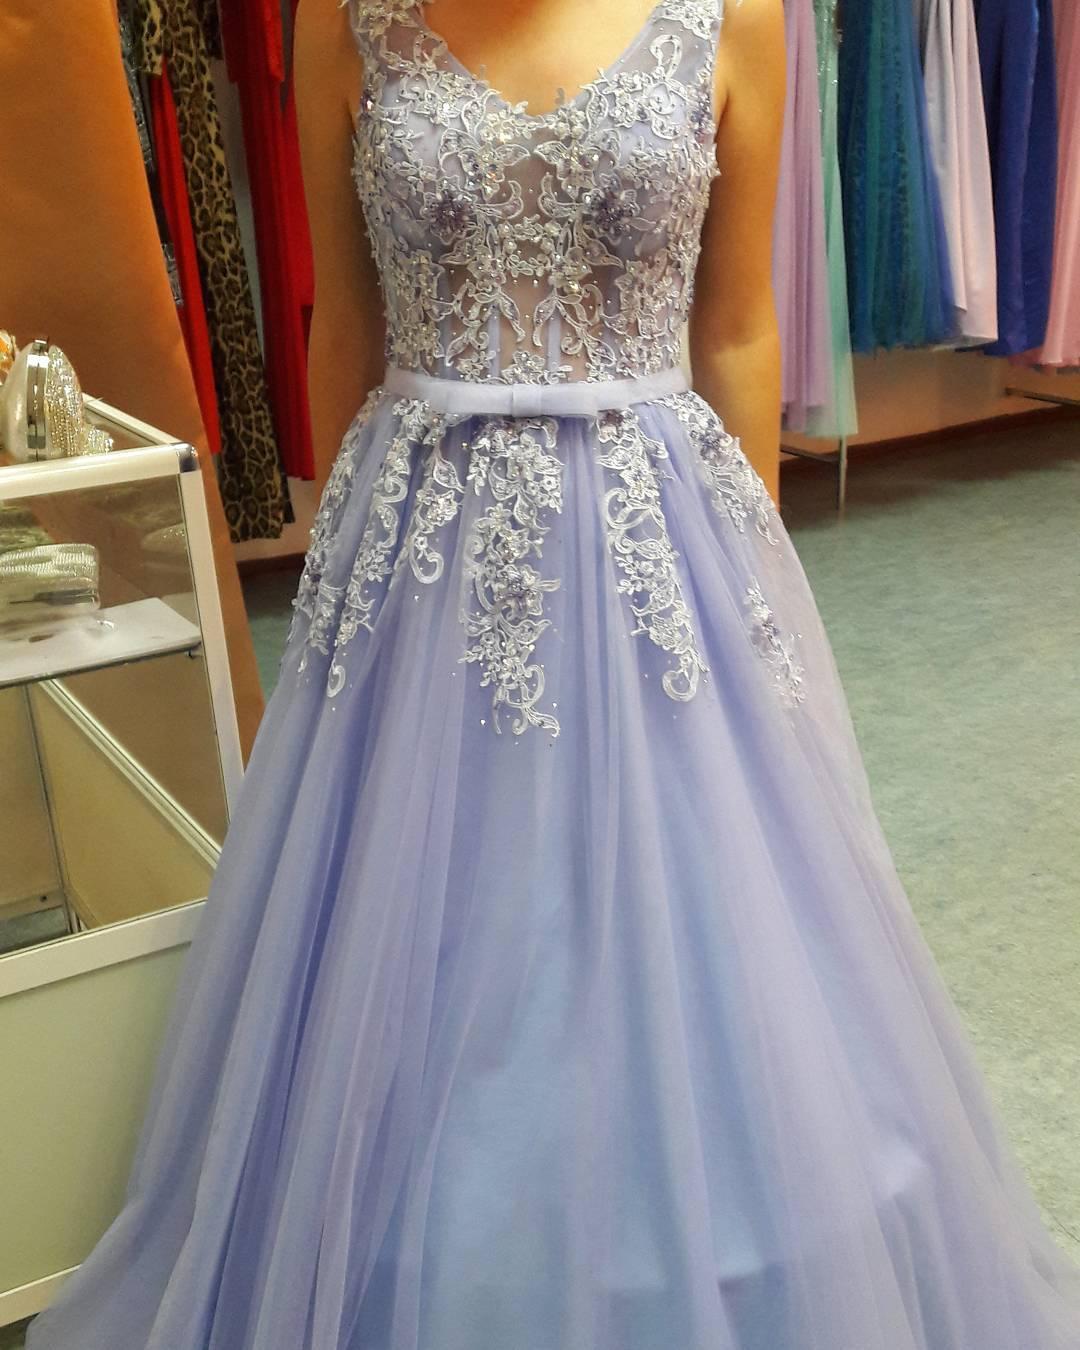 New Arrival Prom Dress,Modest Prom Dres,long prom dresses,elegant ...